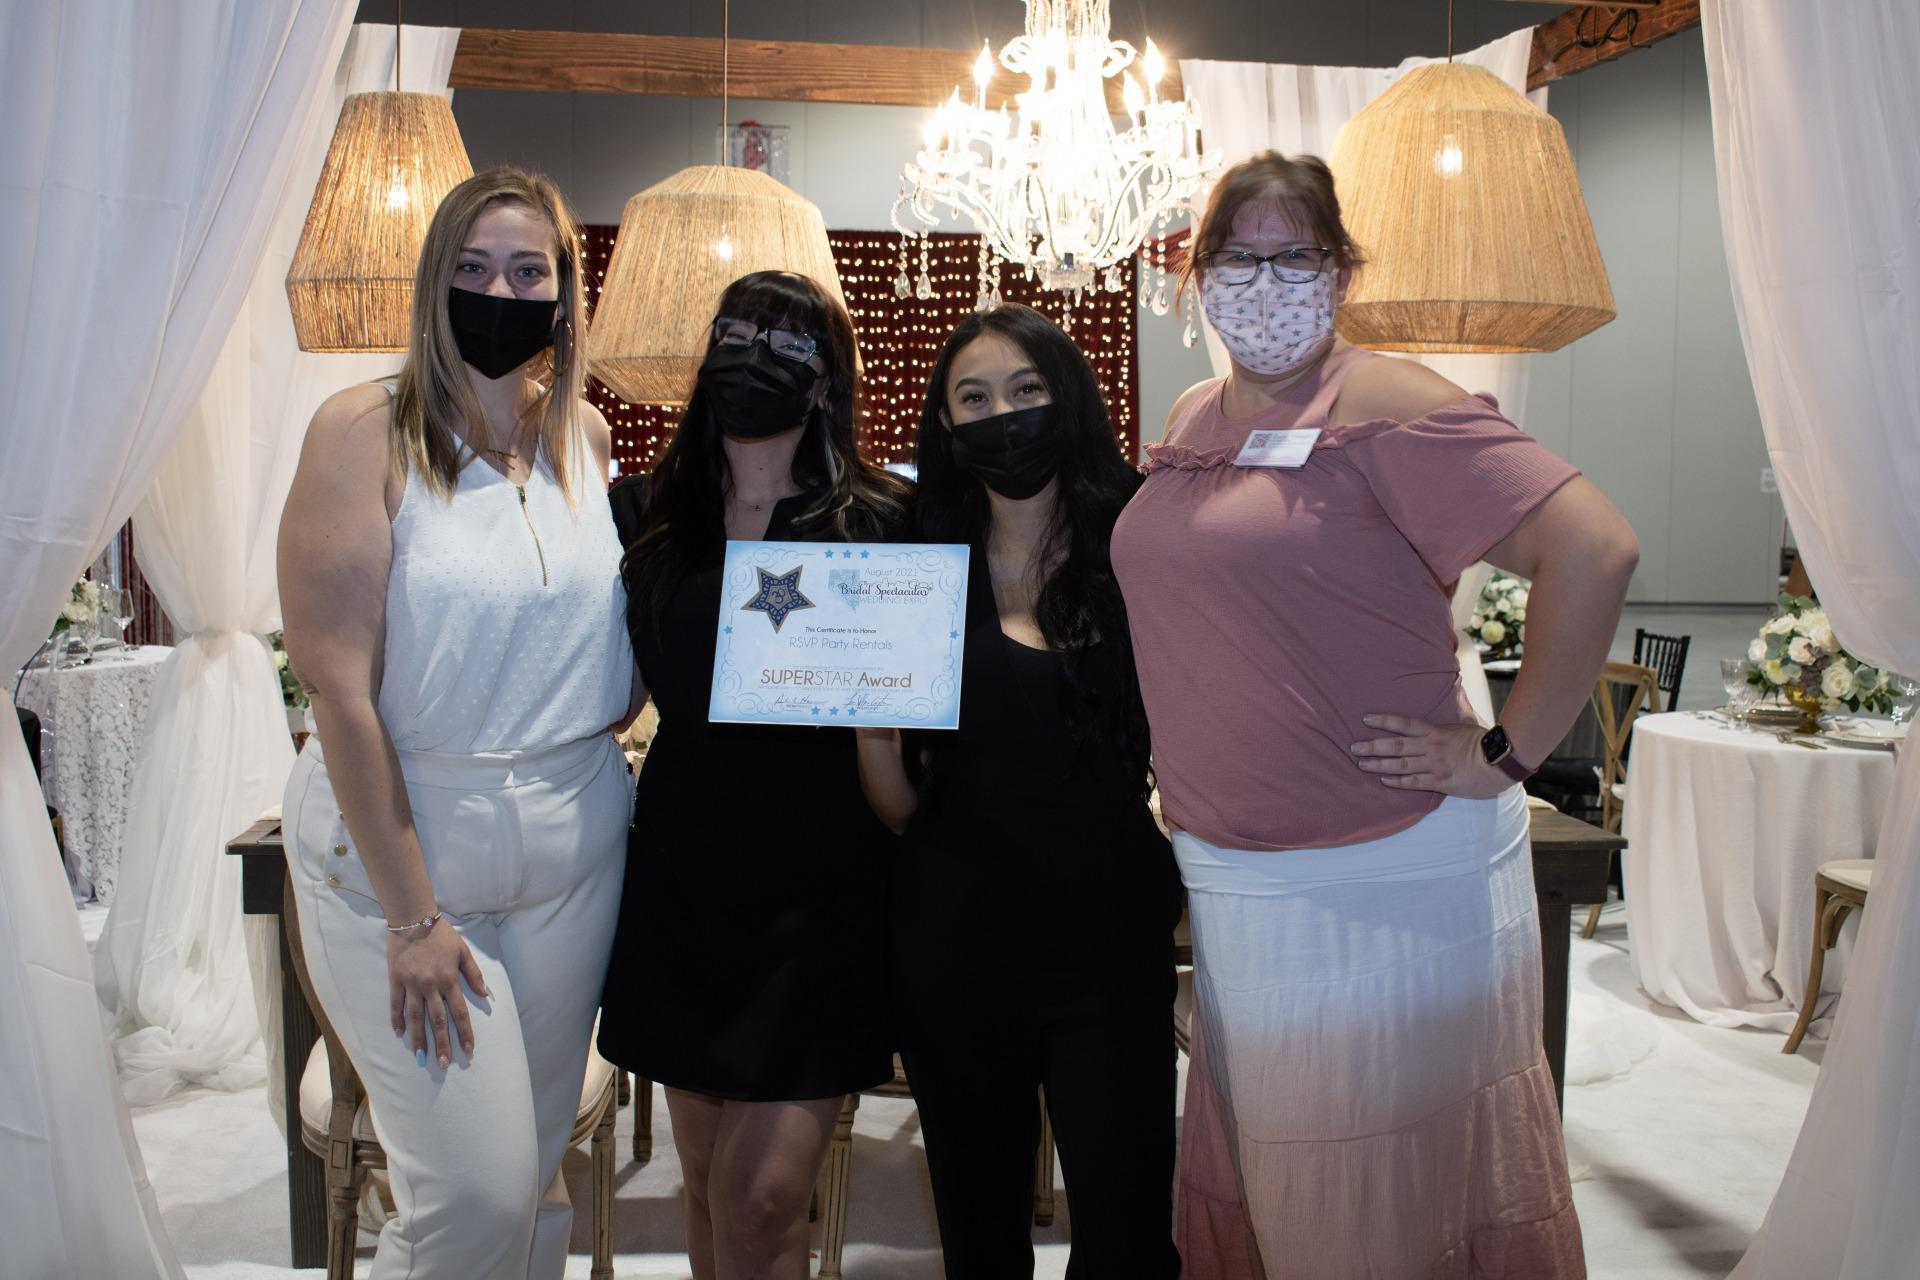 RSVP party rentals Las Vegas Wedding Professionals receives Star award at Las Vegas Bridal Show Bridal Spectacular